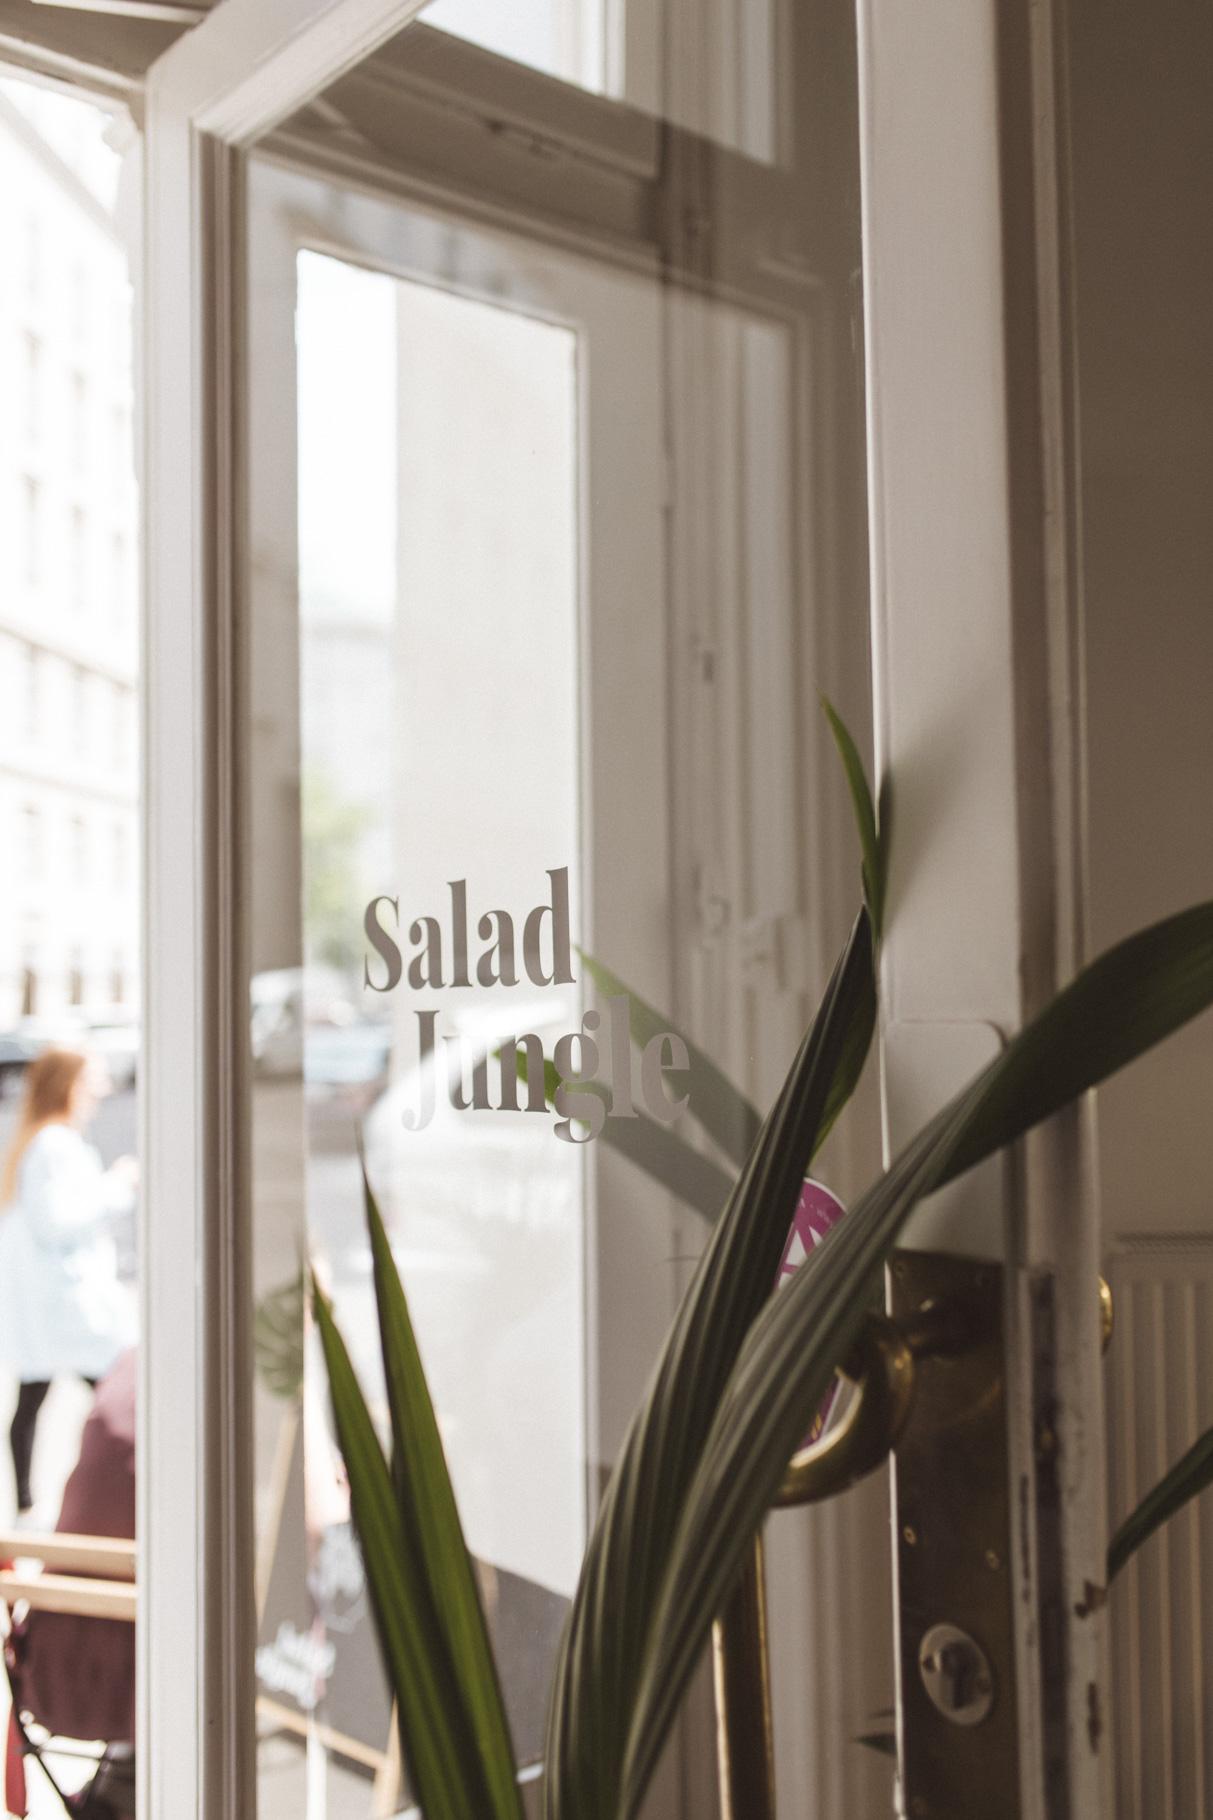 wien tipp, guide, salad jungle, annalaurakummer, hanna gassner ,vegan, restaurant